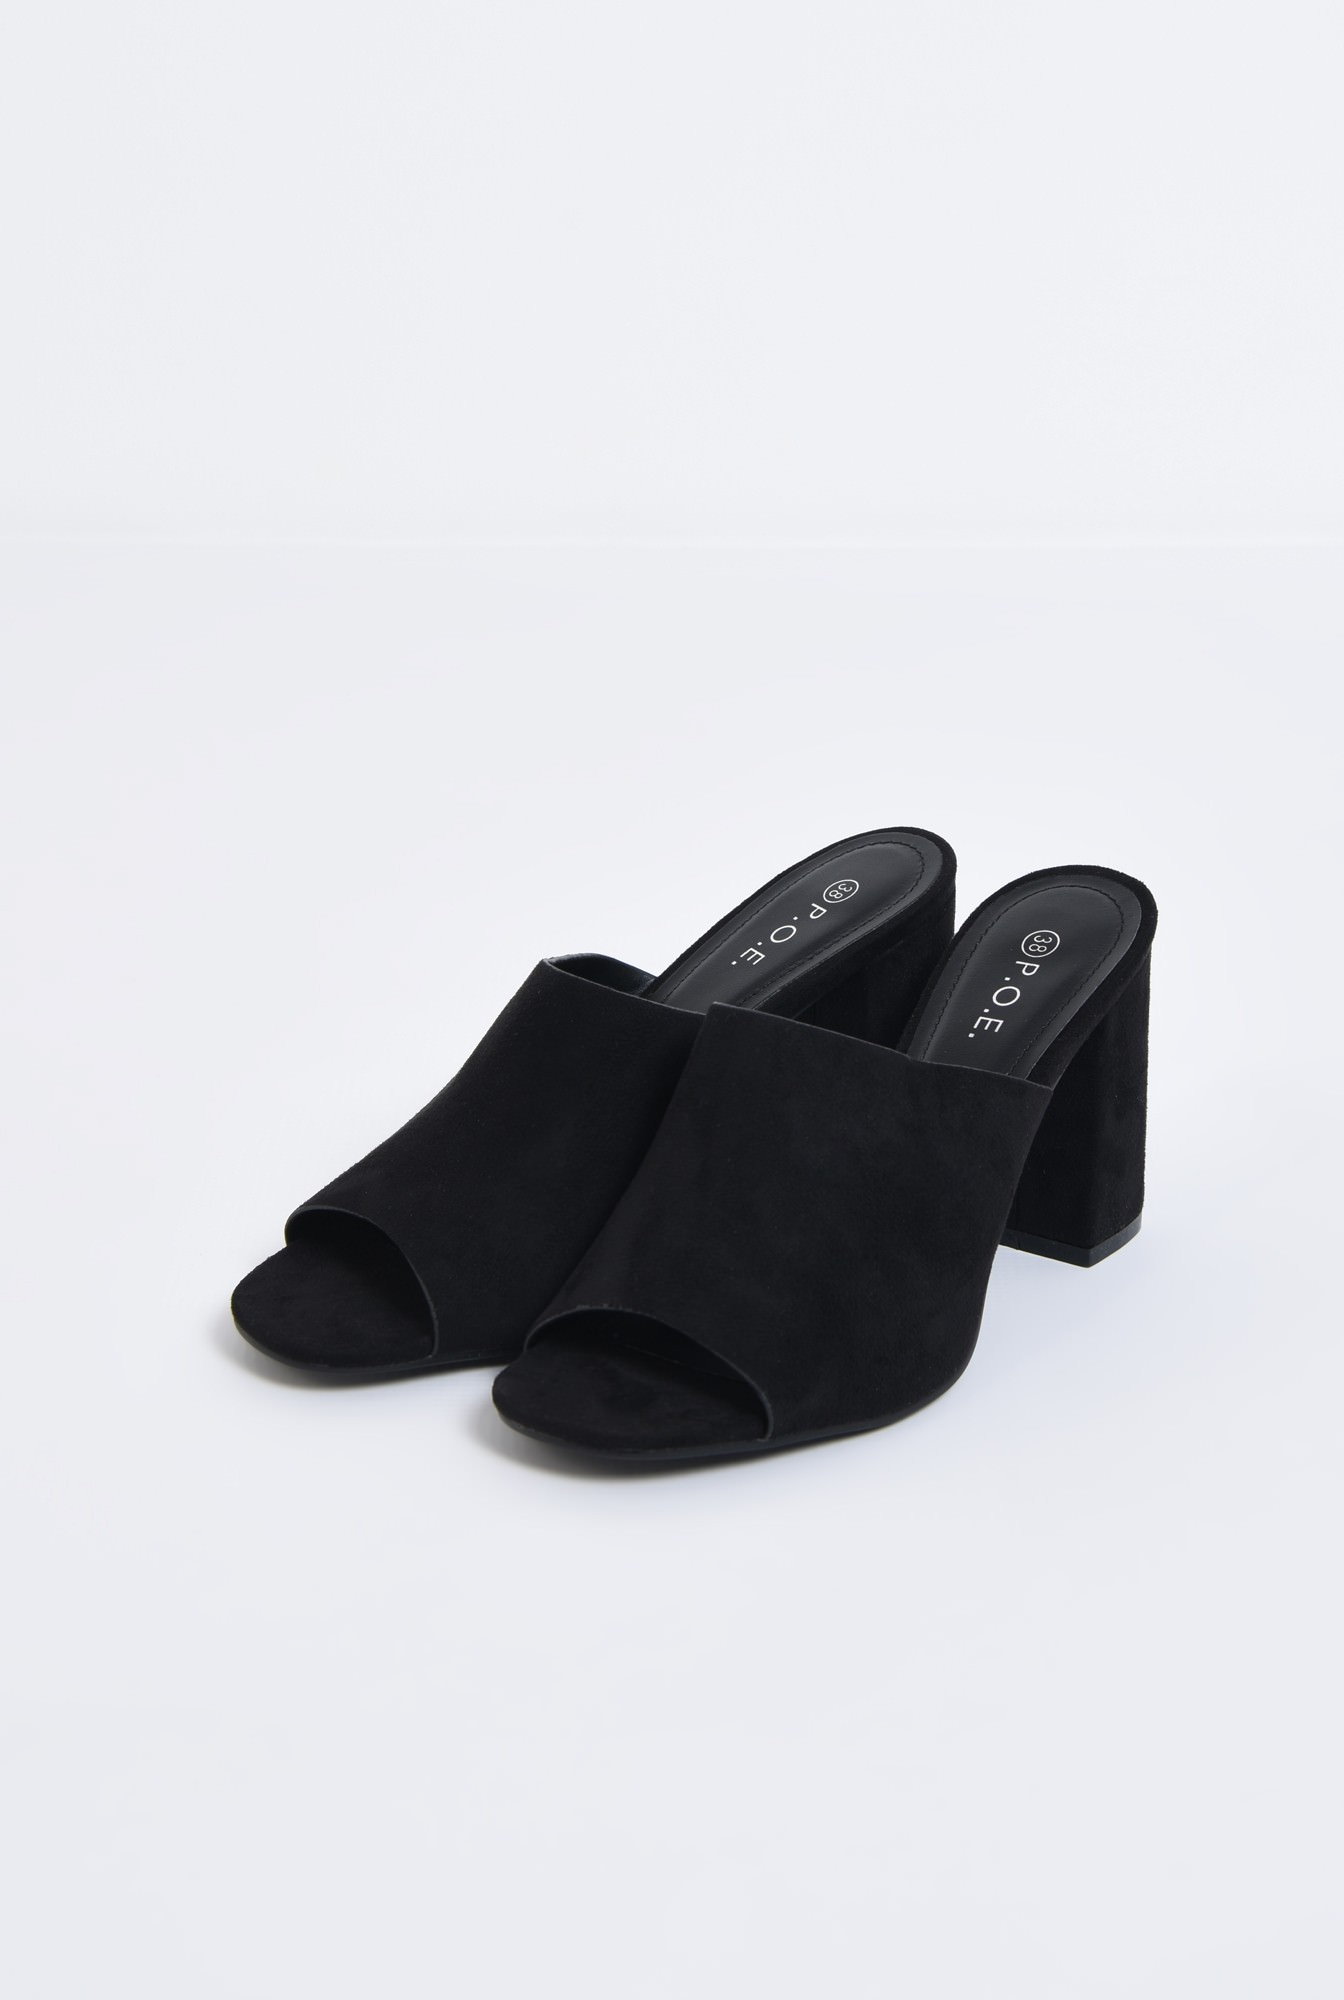 1 - saboti, negru, toc gros, varf decupat, sandale online